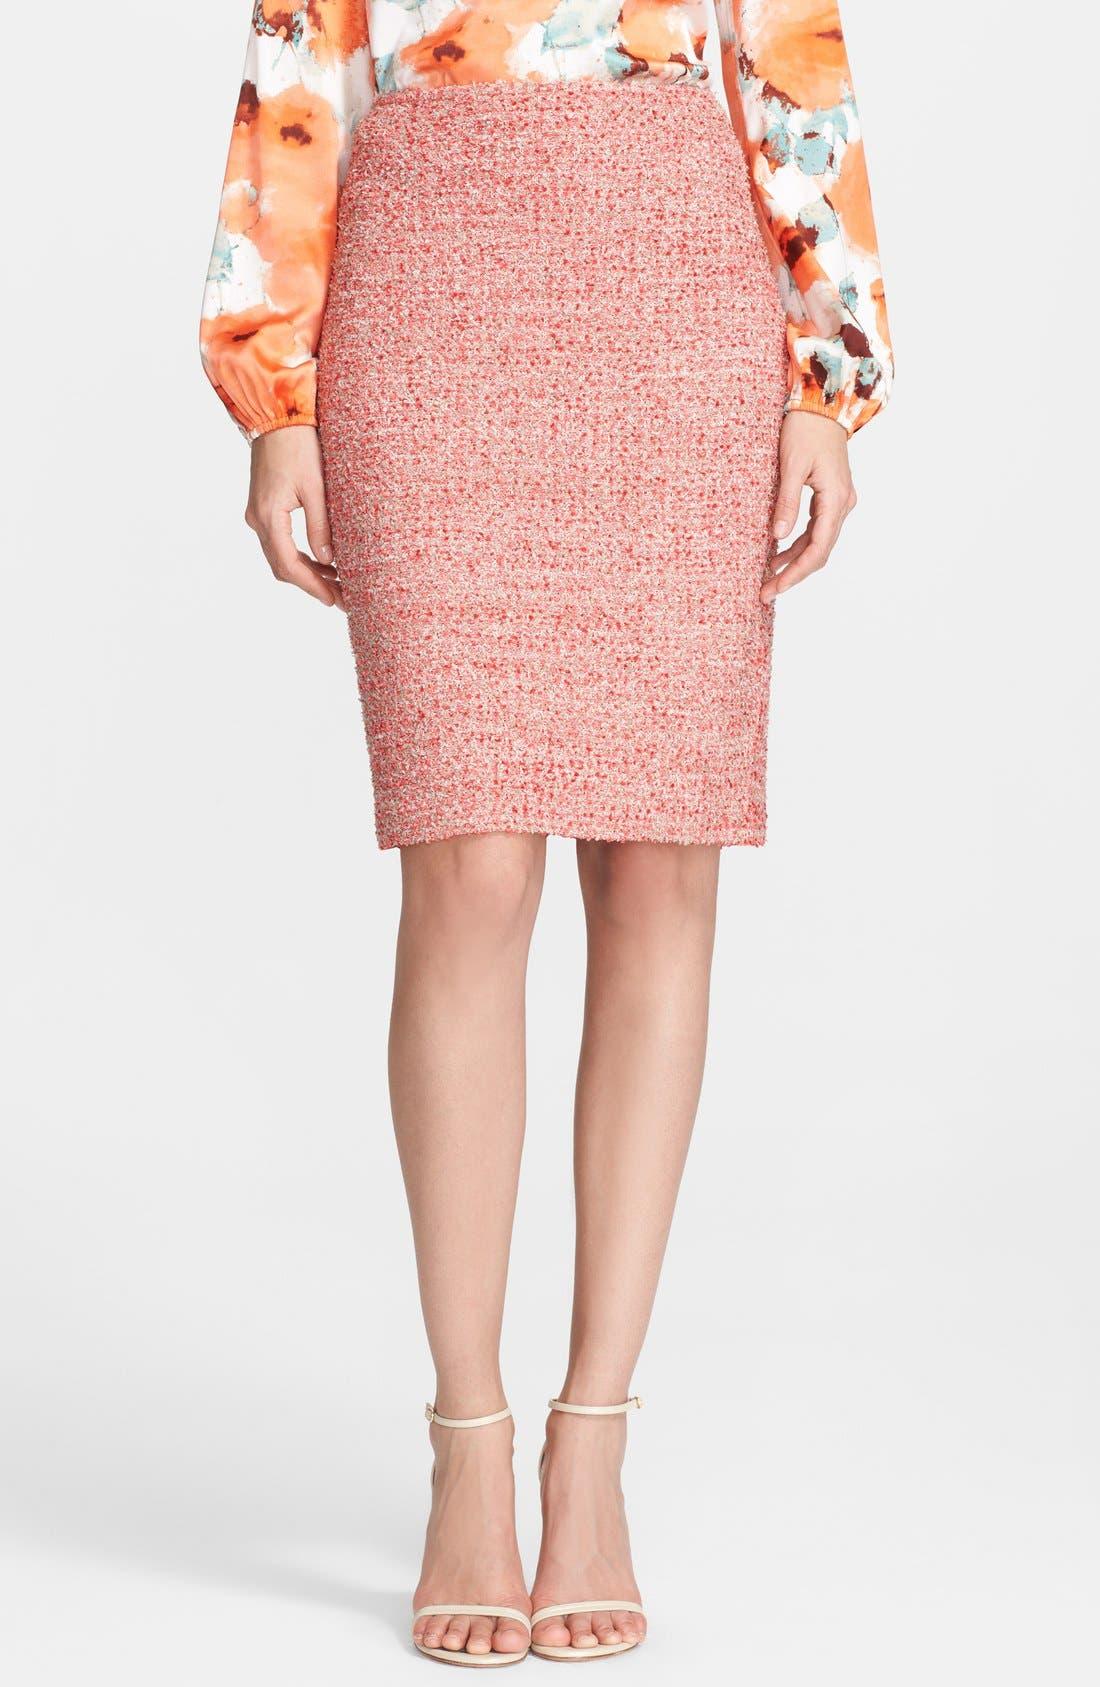 Main Image - St. John Collection Eyelash Sparkle Knit Pencil Skirt